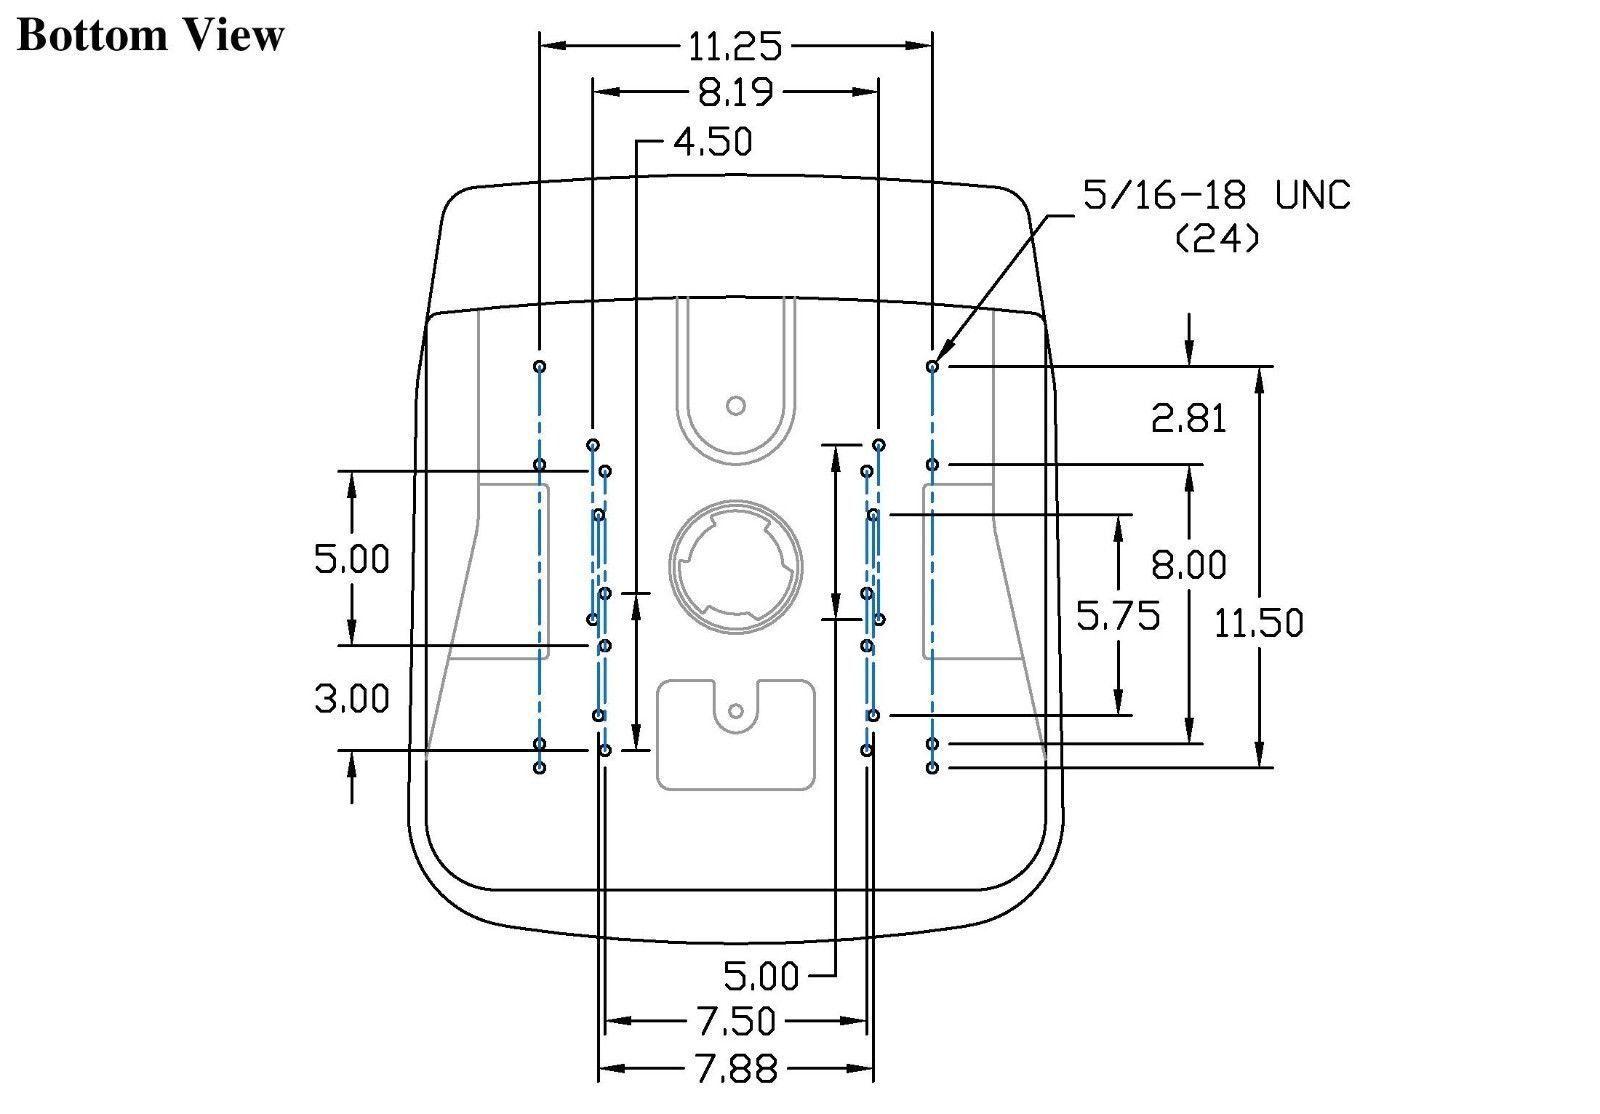 Wiring Diagram For A John Deere Gator